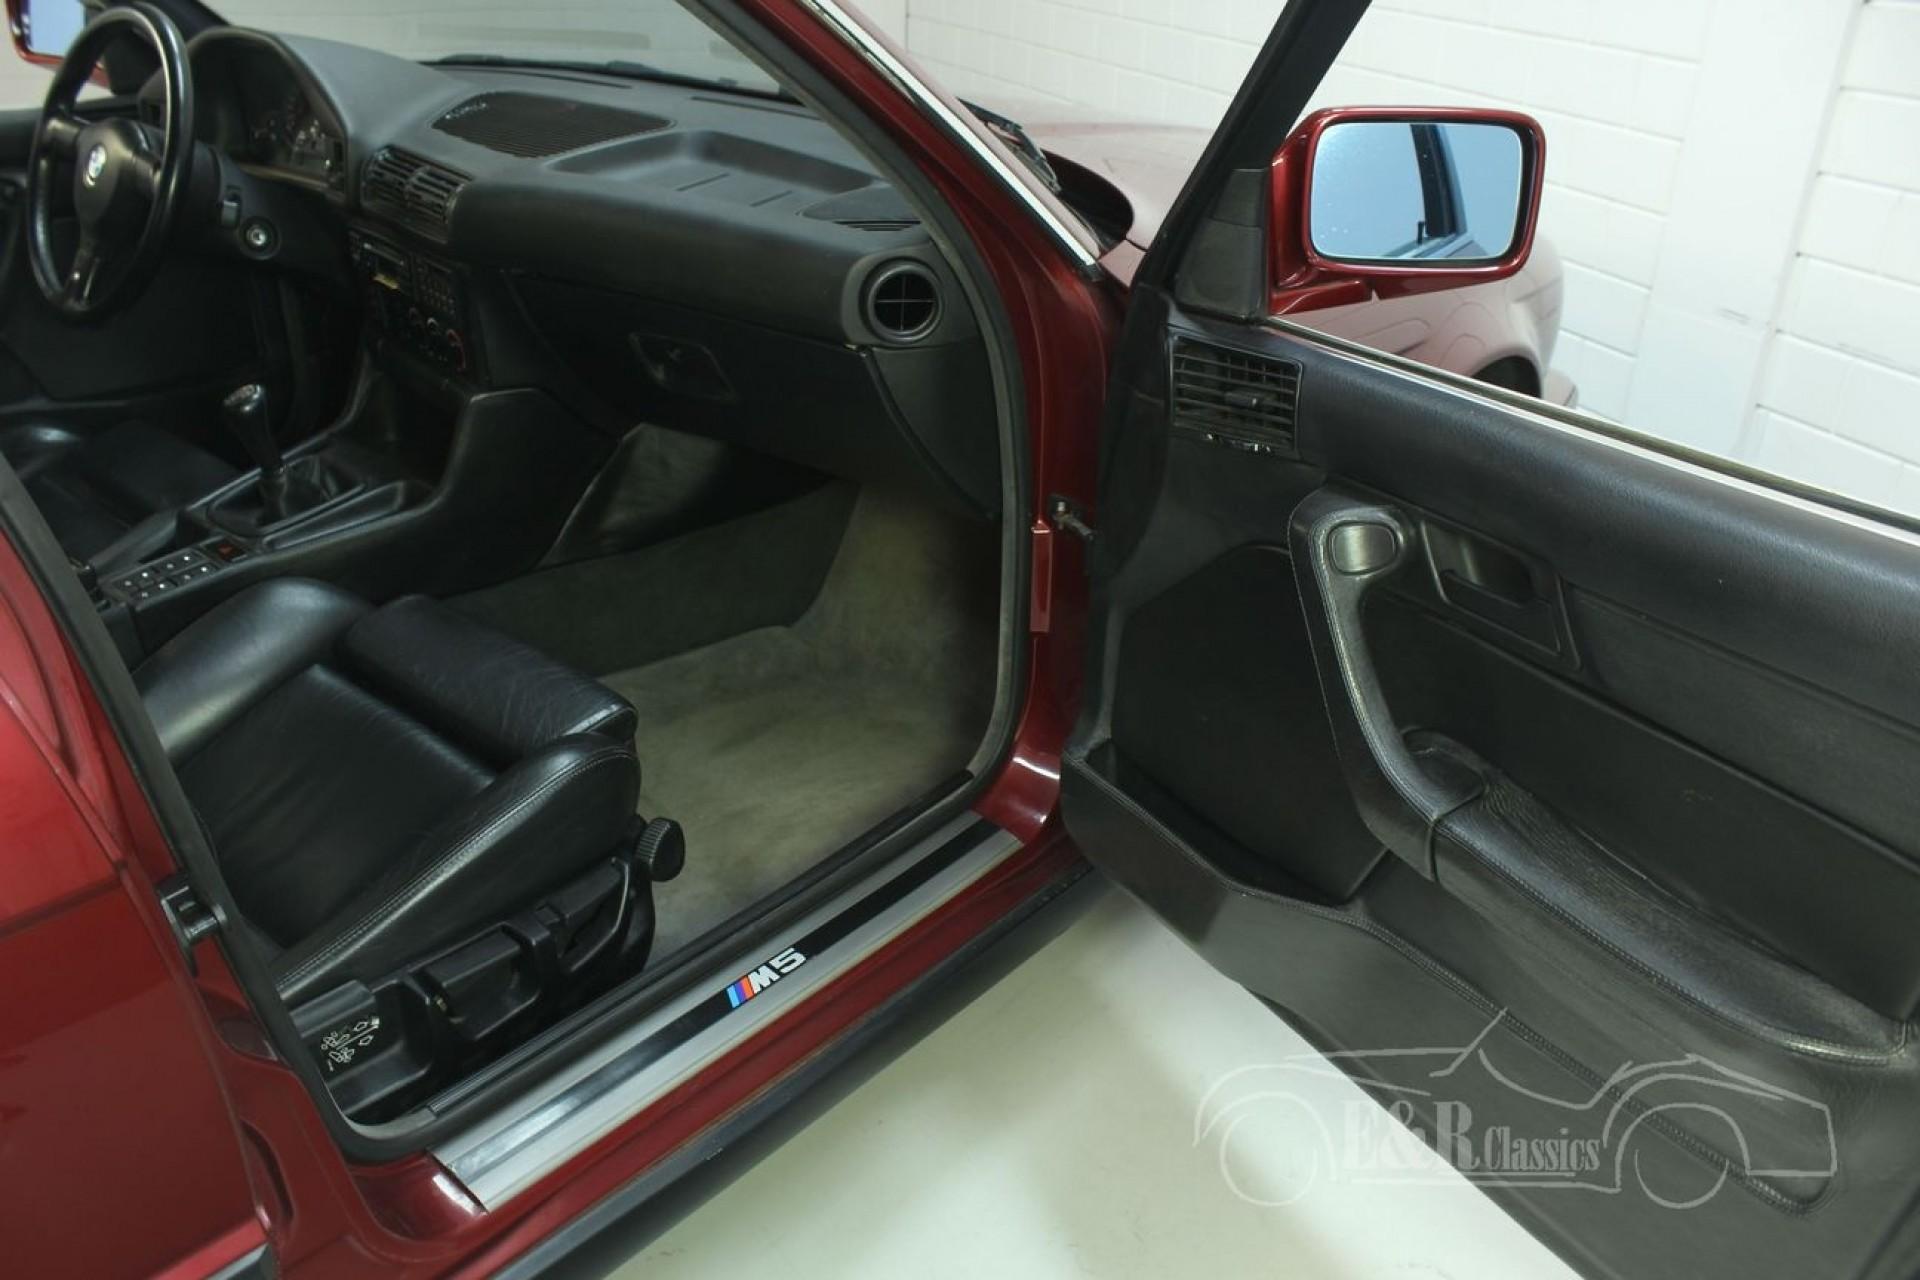 Bmw M5 E34 Sedan 1992 Zum Kauf Bei Erclassics